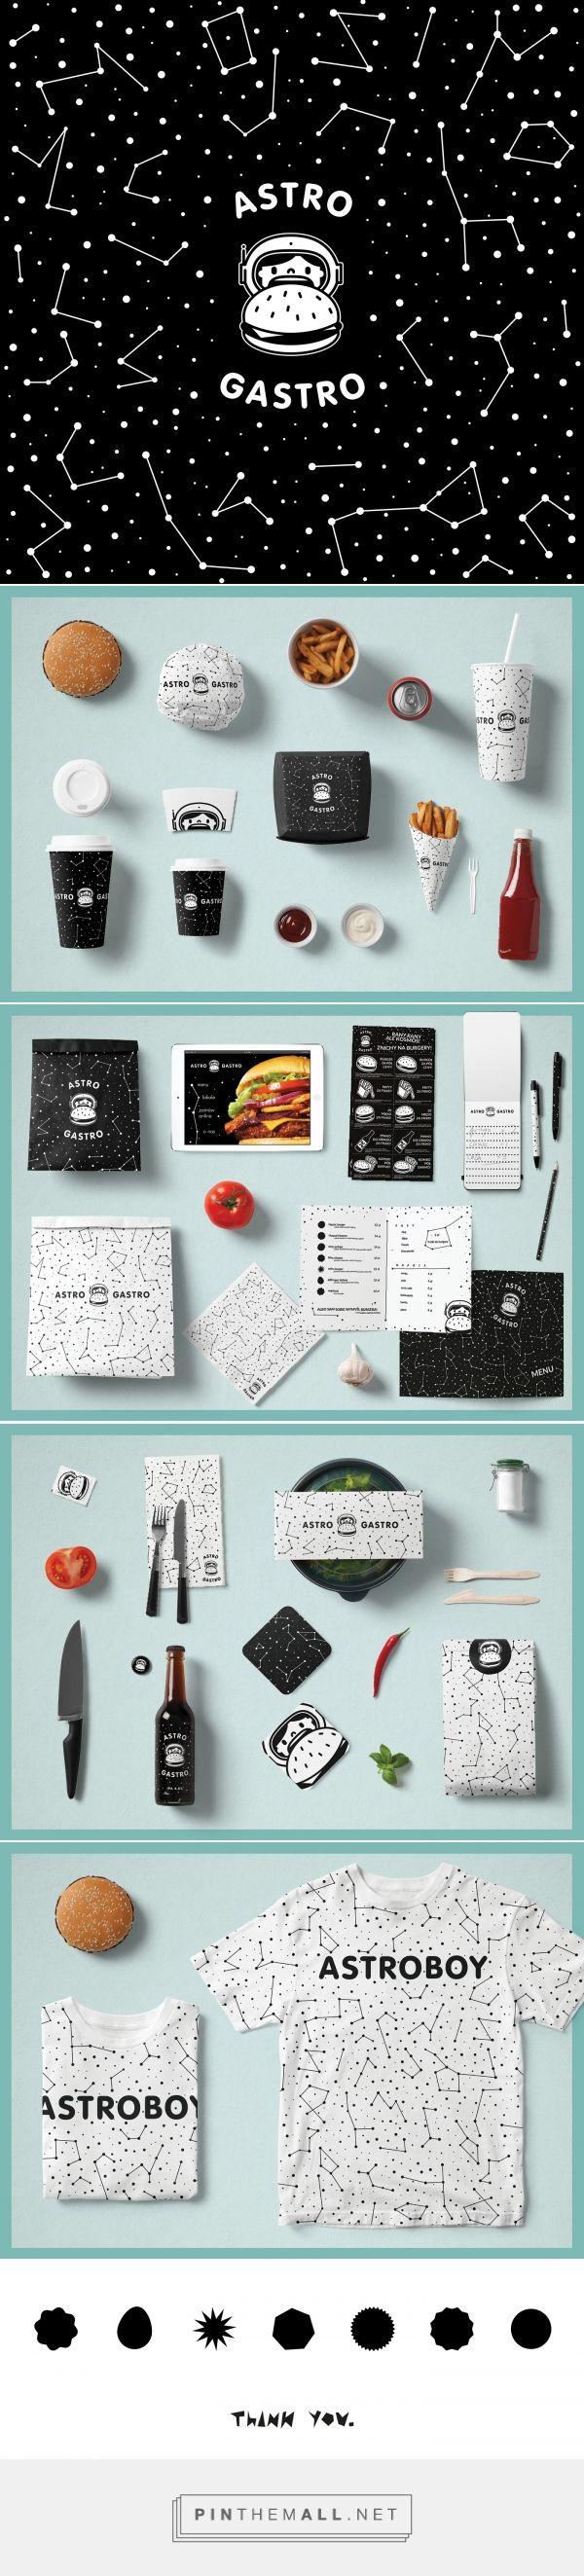 Astro Gastro Burger Bar Branding by Tomek Domanski   Fivestar Branding – Design and Branding Agency & Inspiration Gallery